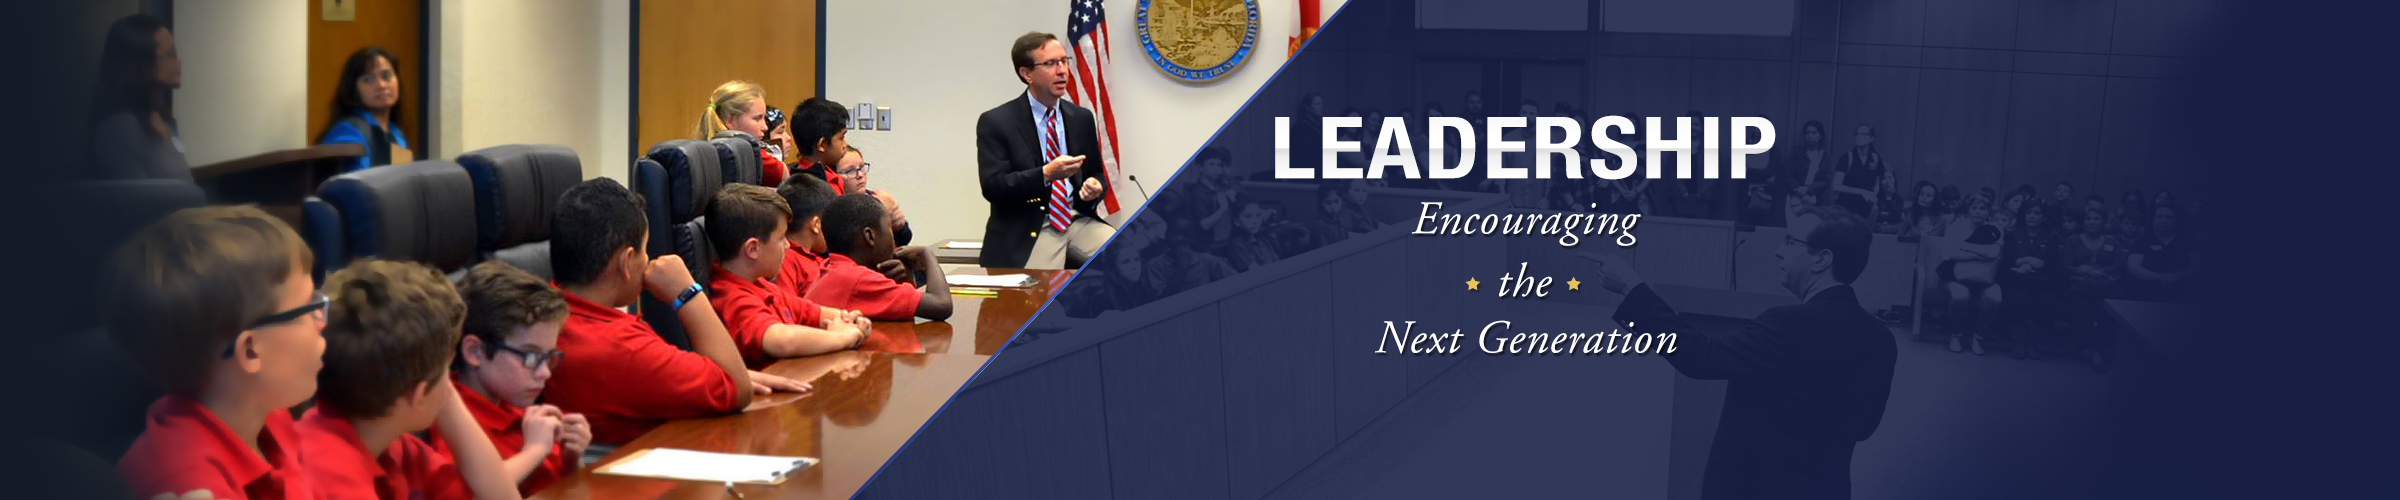 Brian Haas Leadership Encouraging the Next Generation